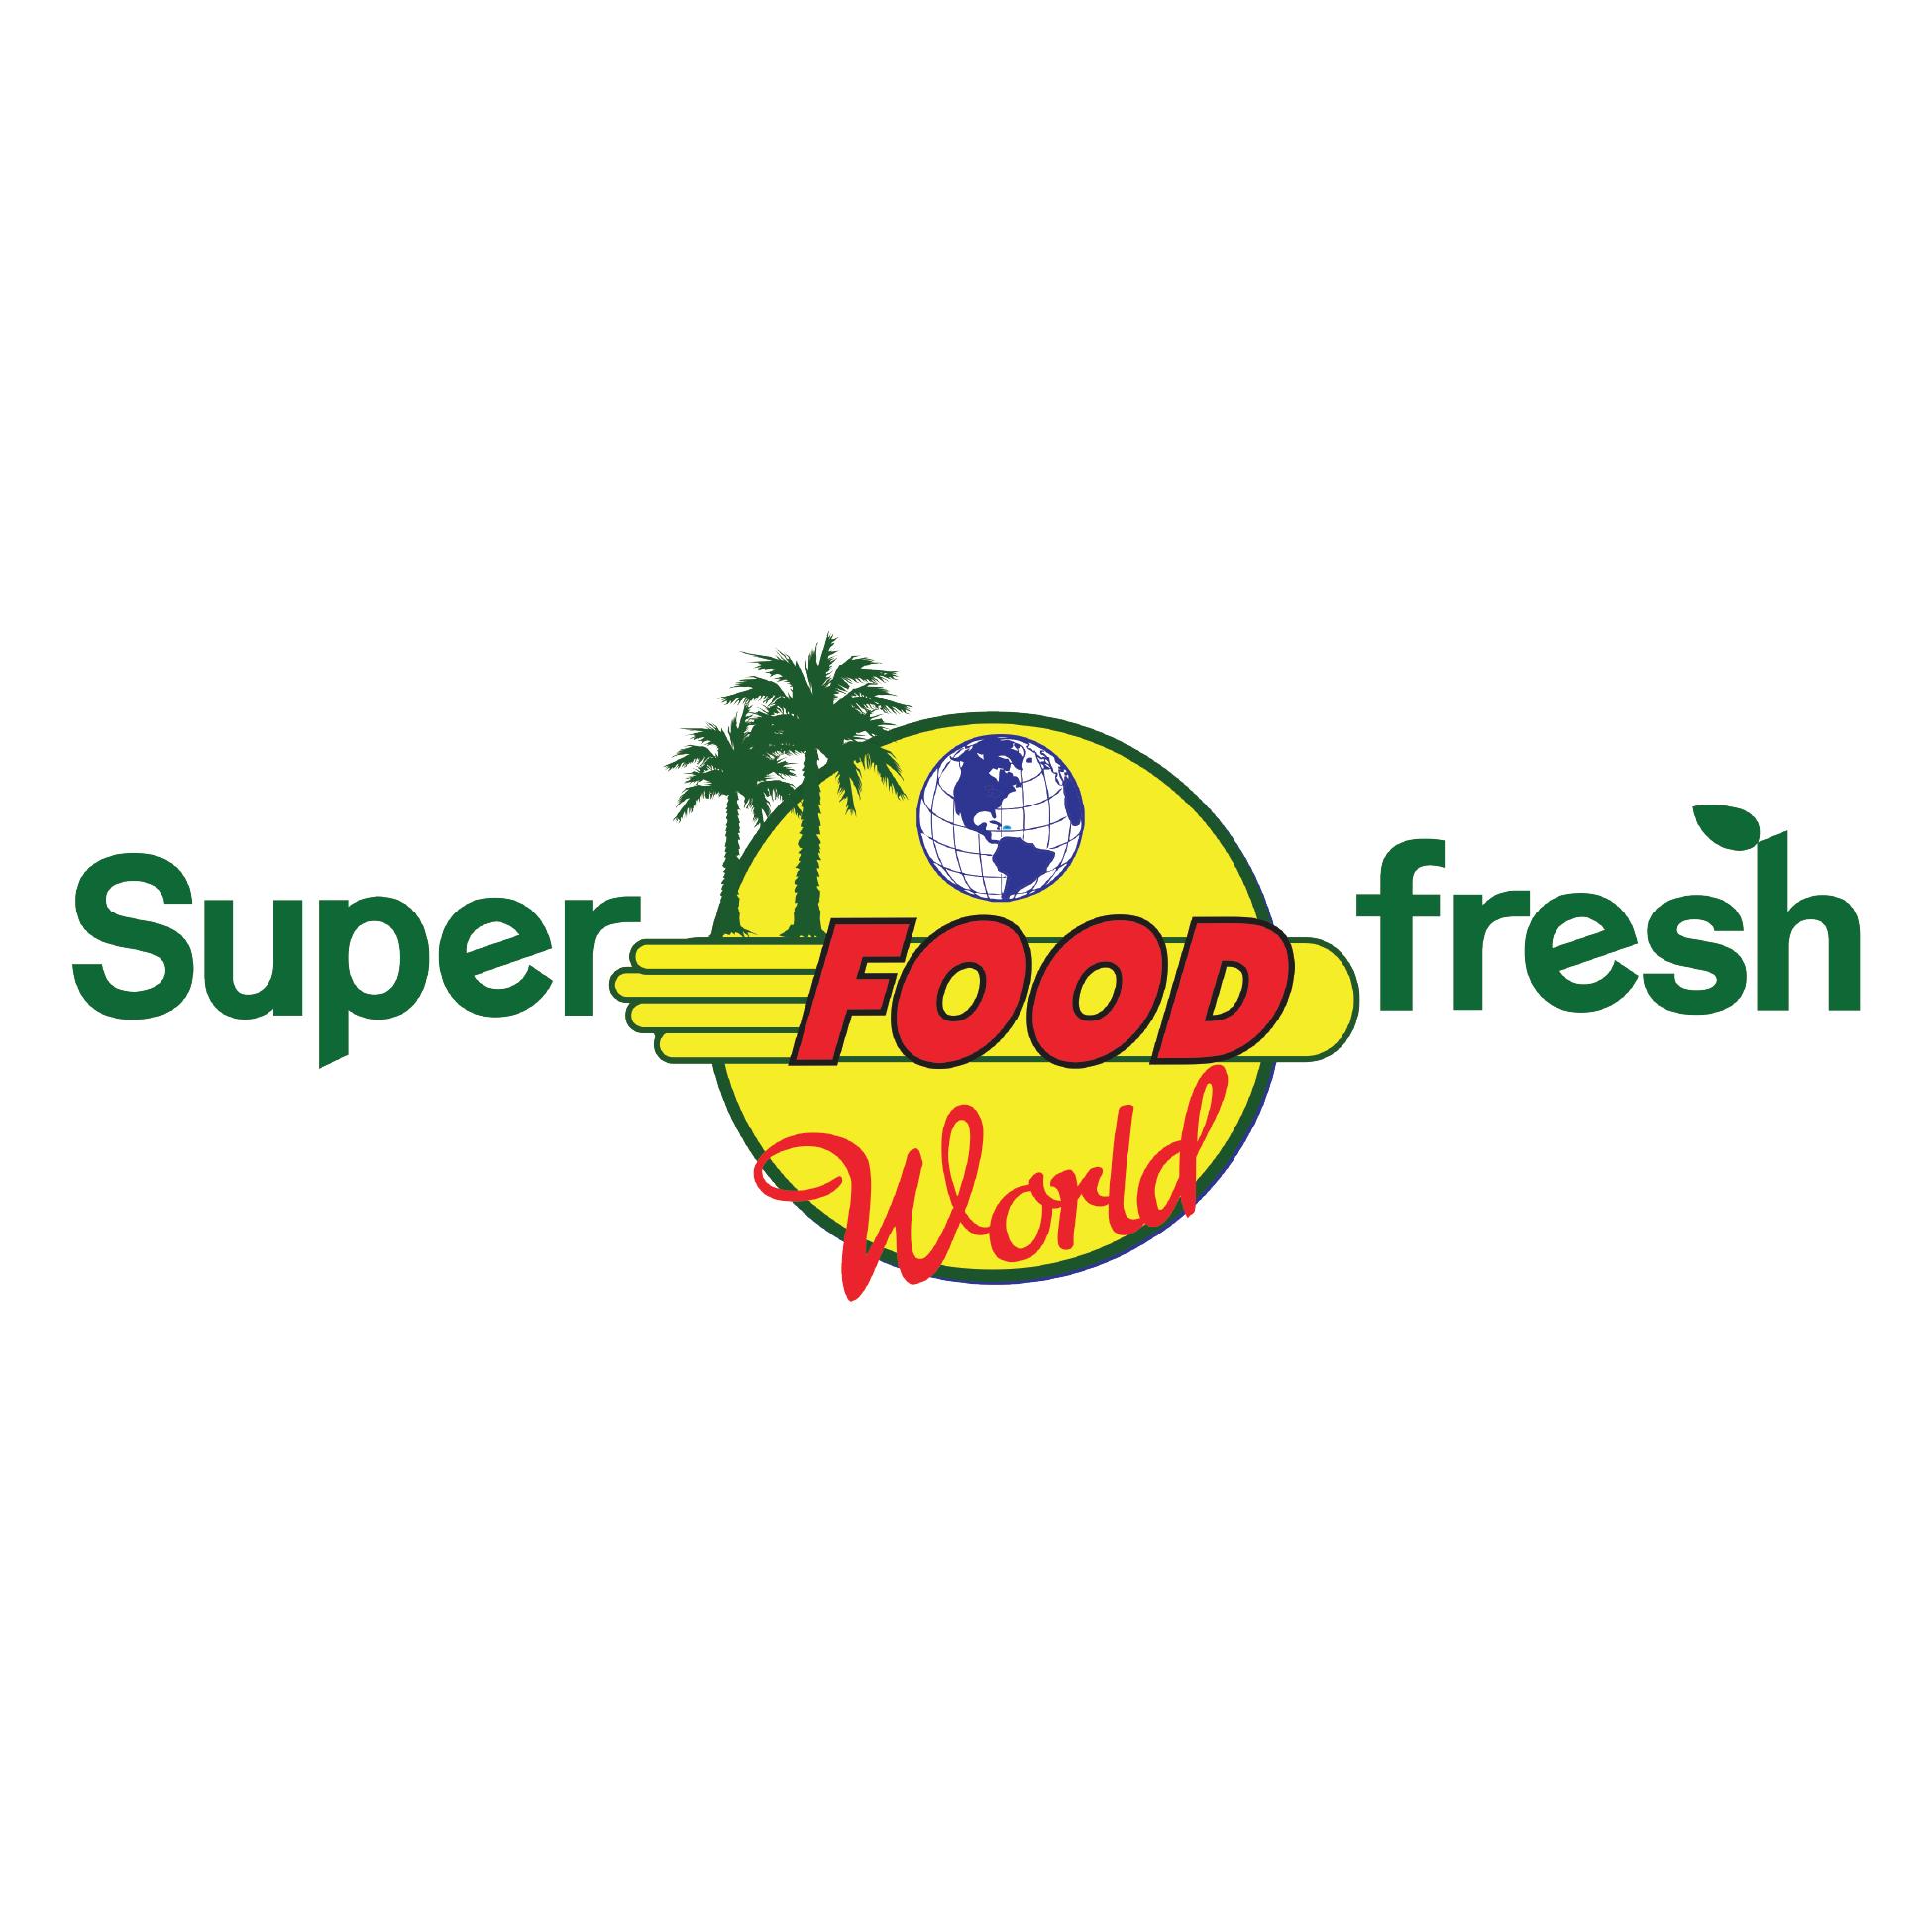 Superfresh Food World logo